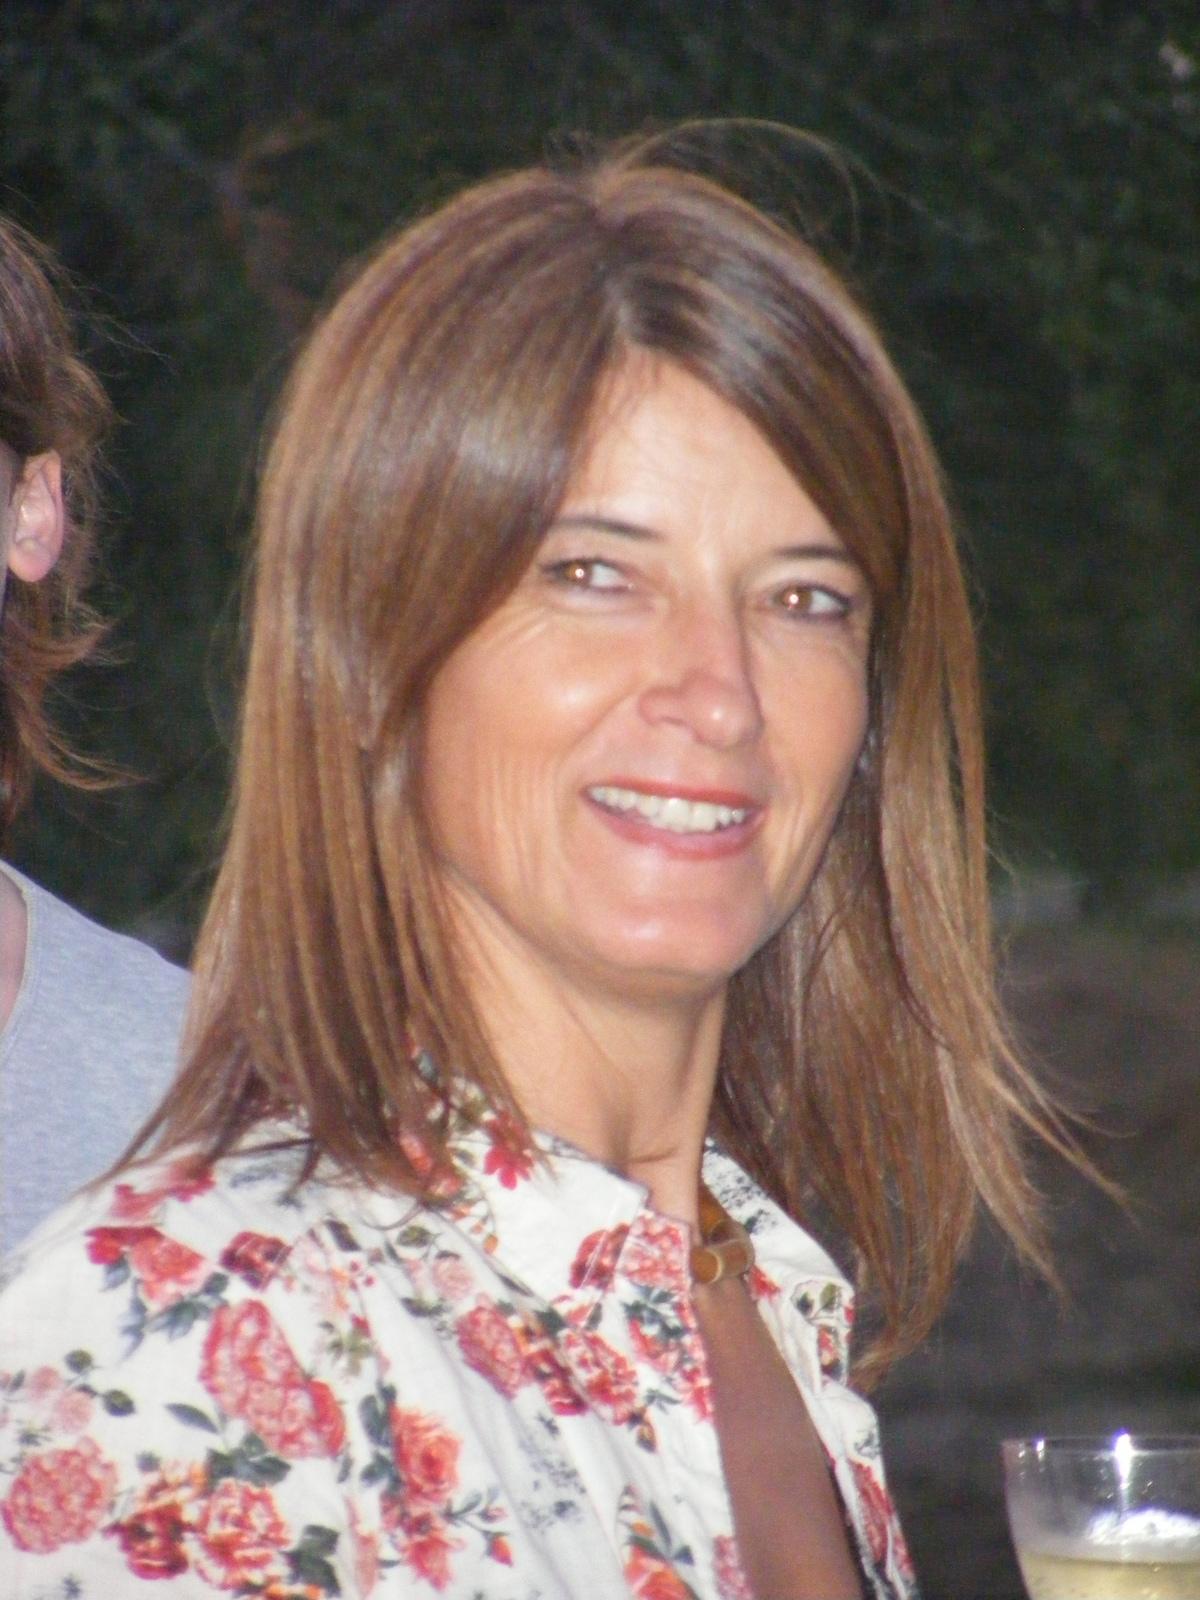 Viktorija from Izola